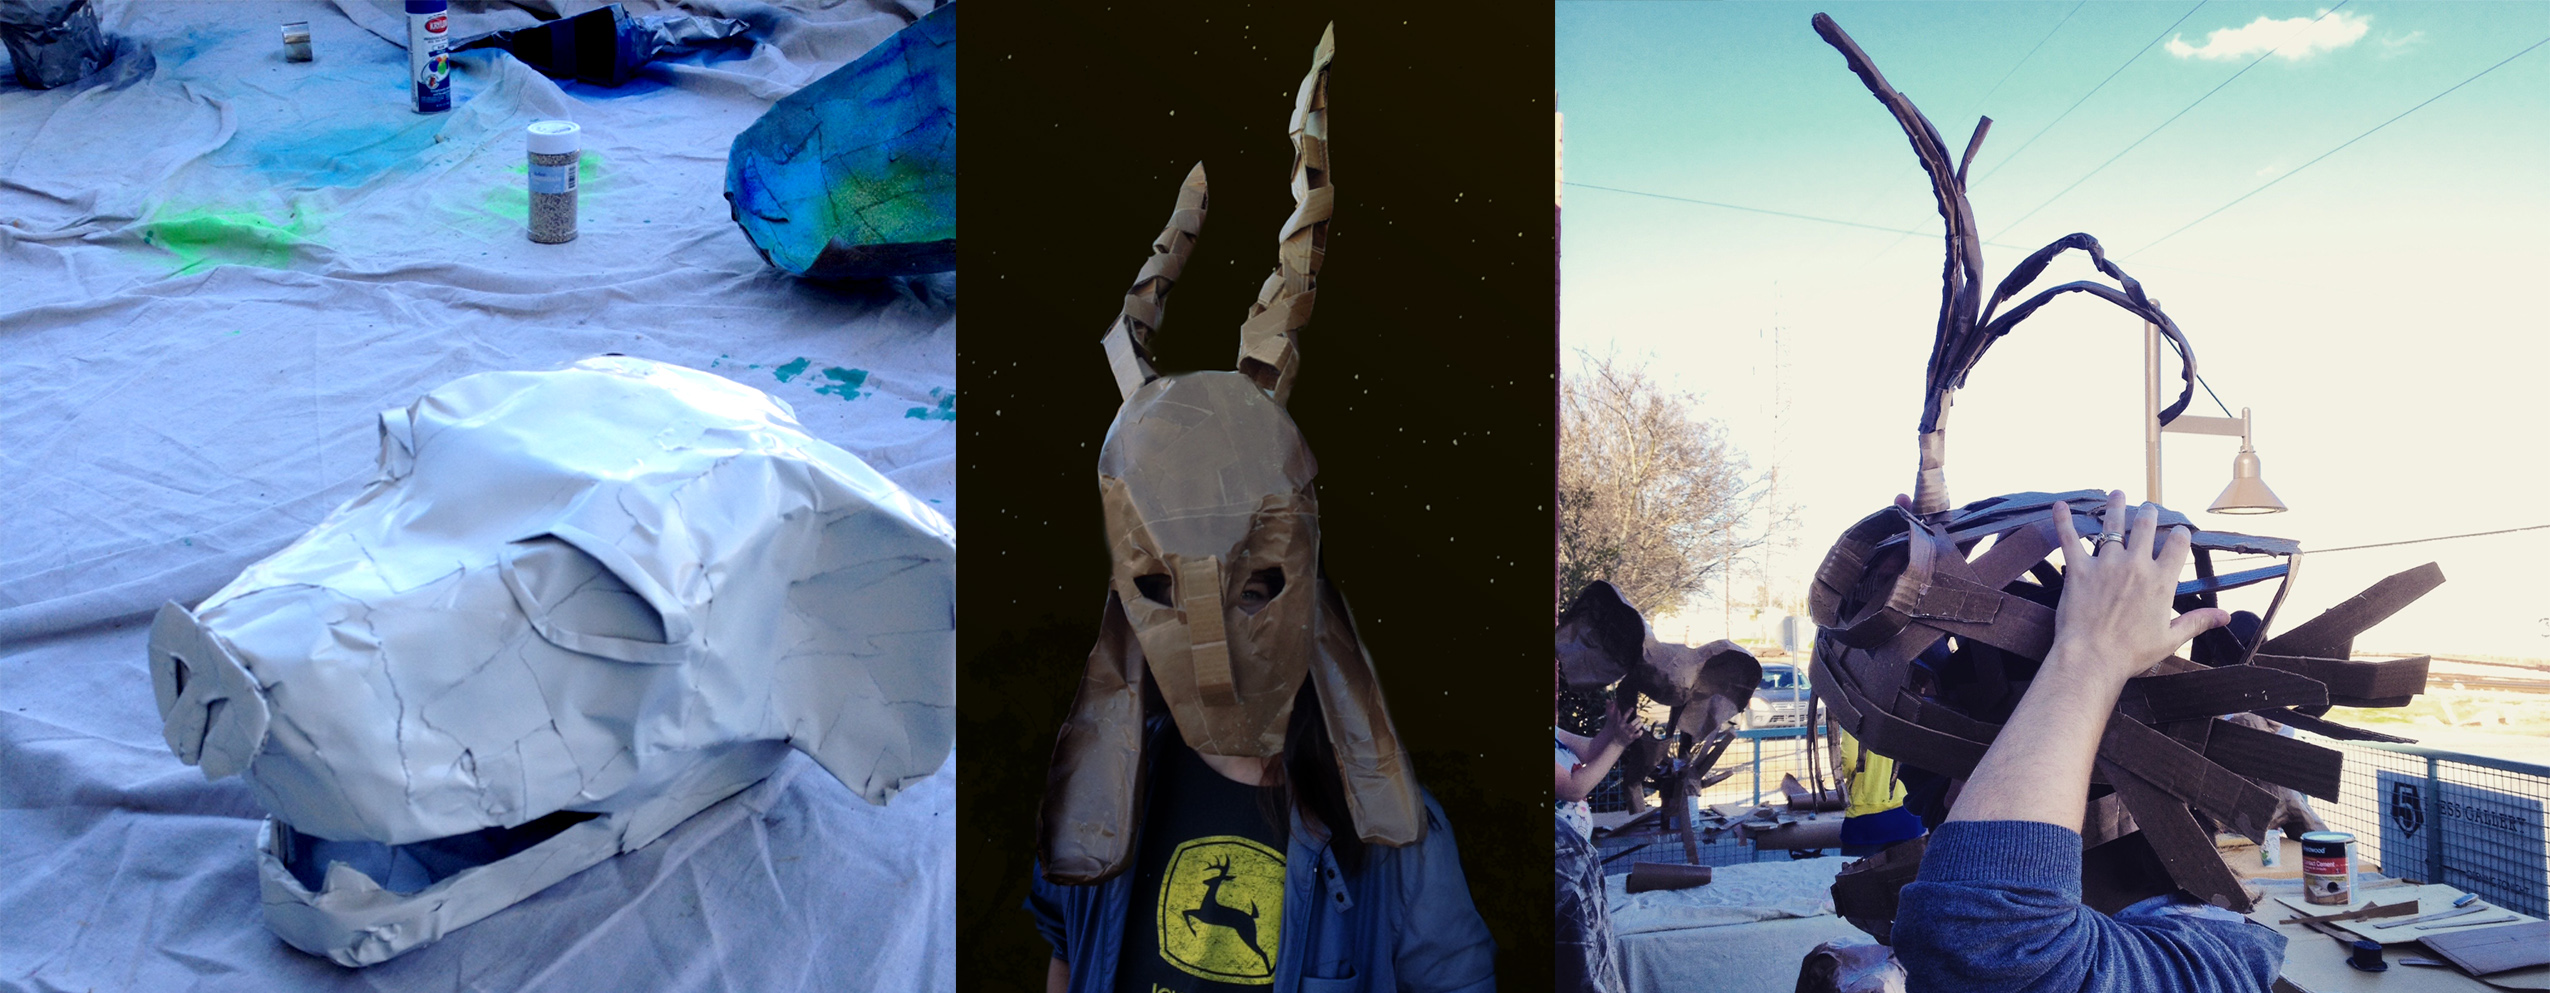 5 Press Gallery's Arts Classes For Adults: Papier-Mâché Mask-Making & Experimental Film